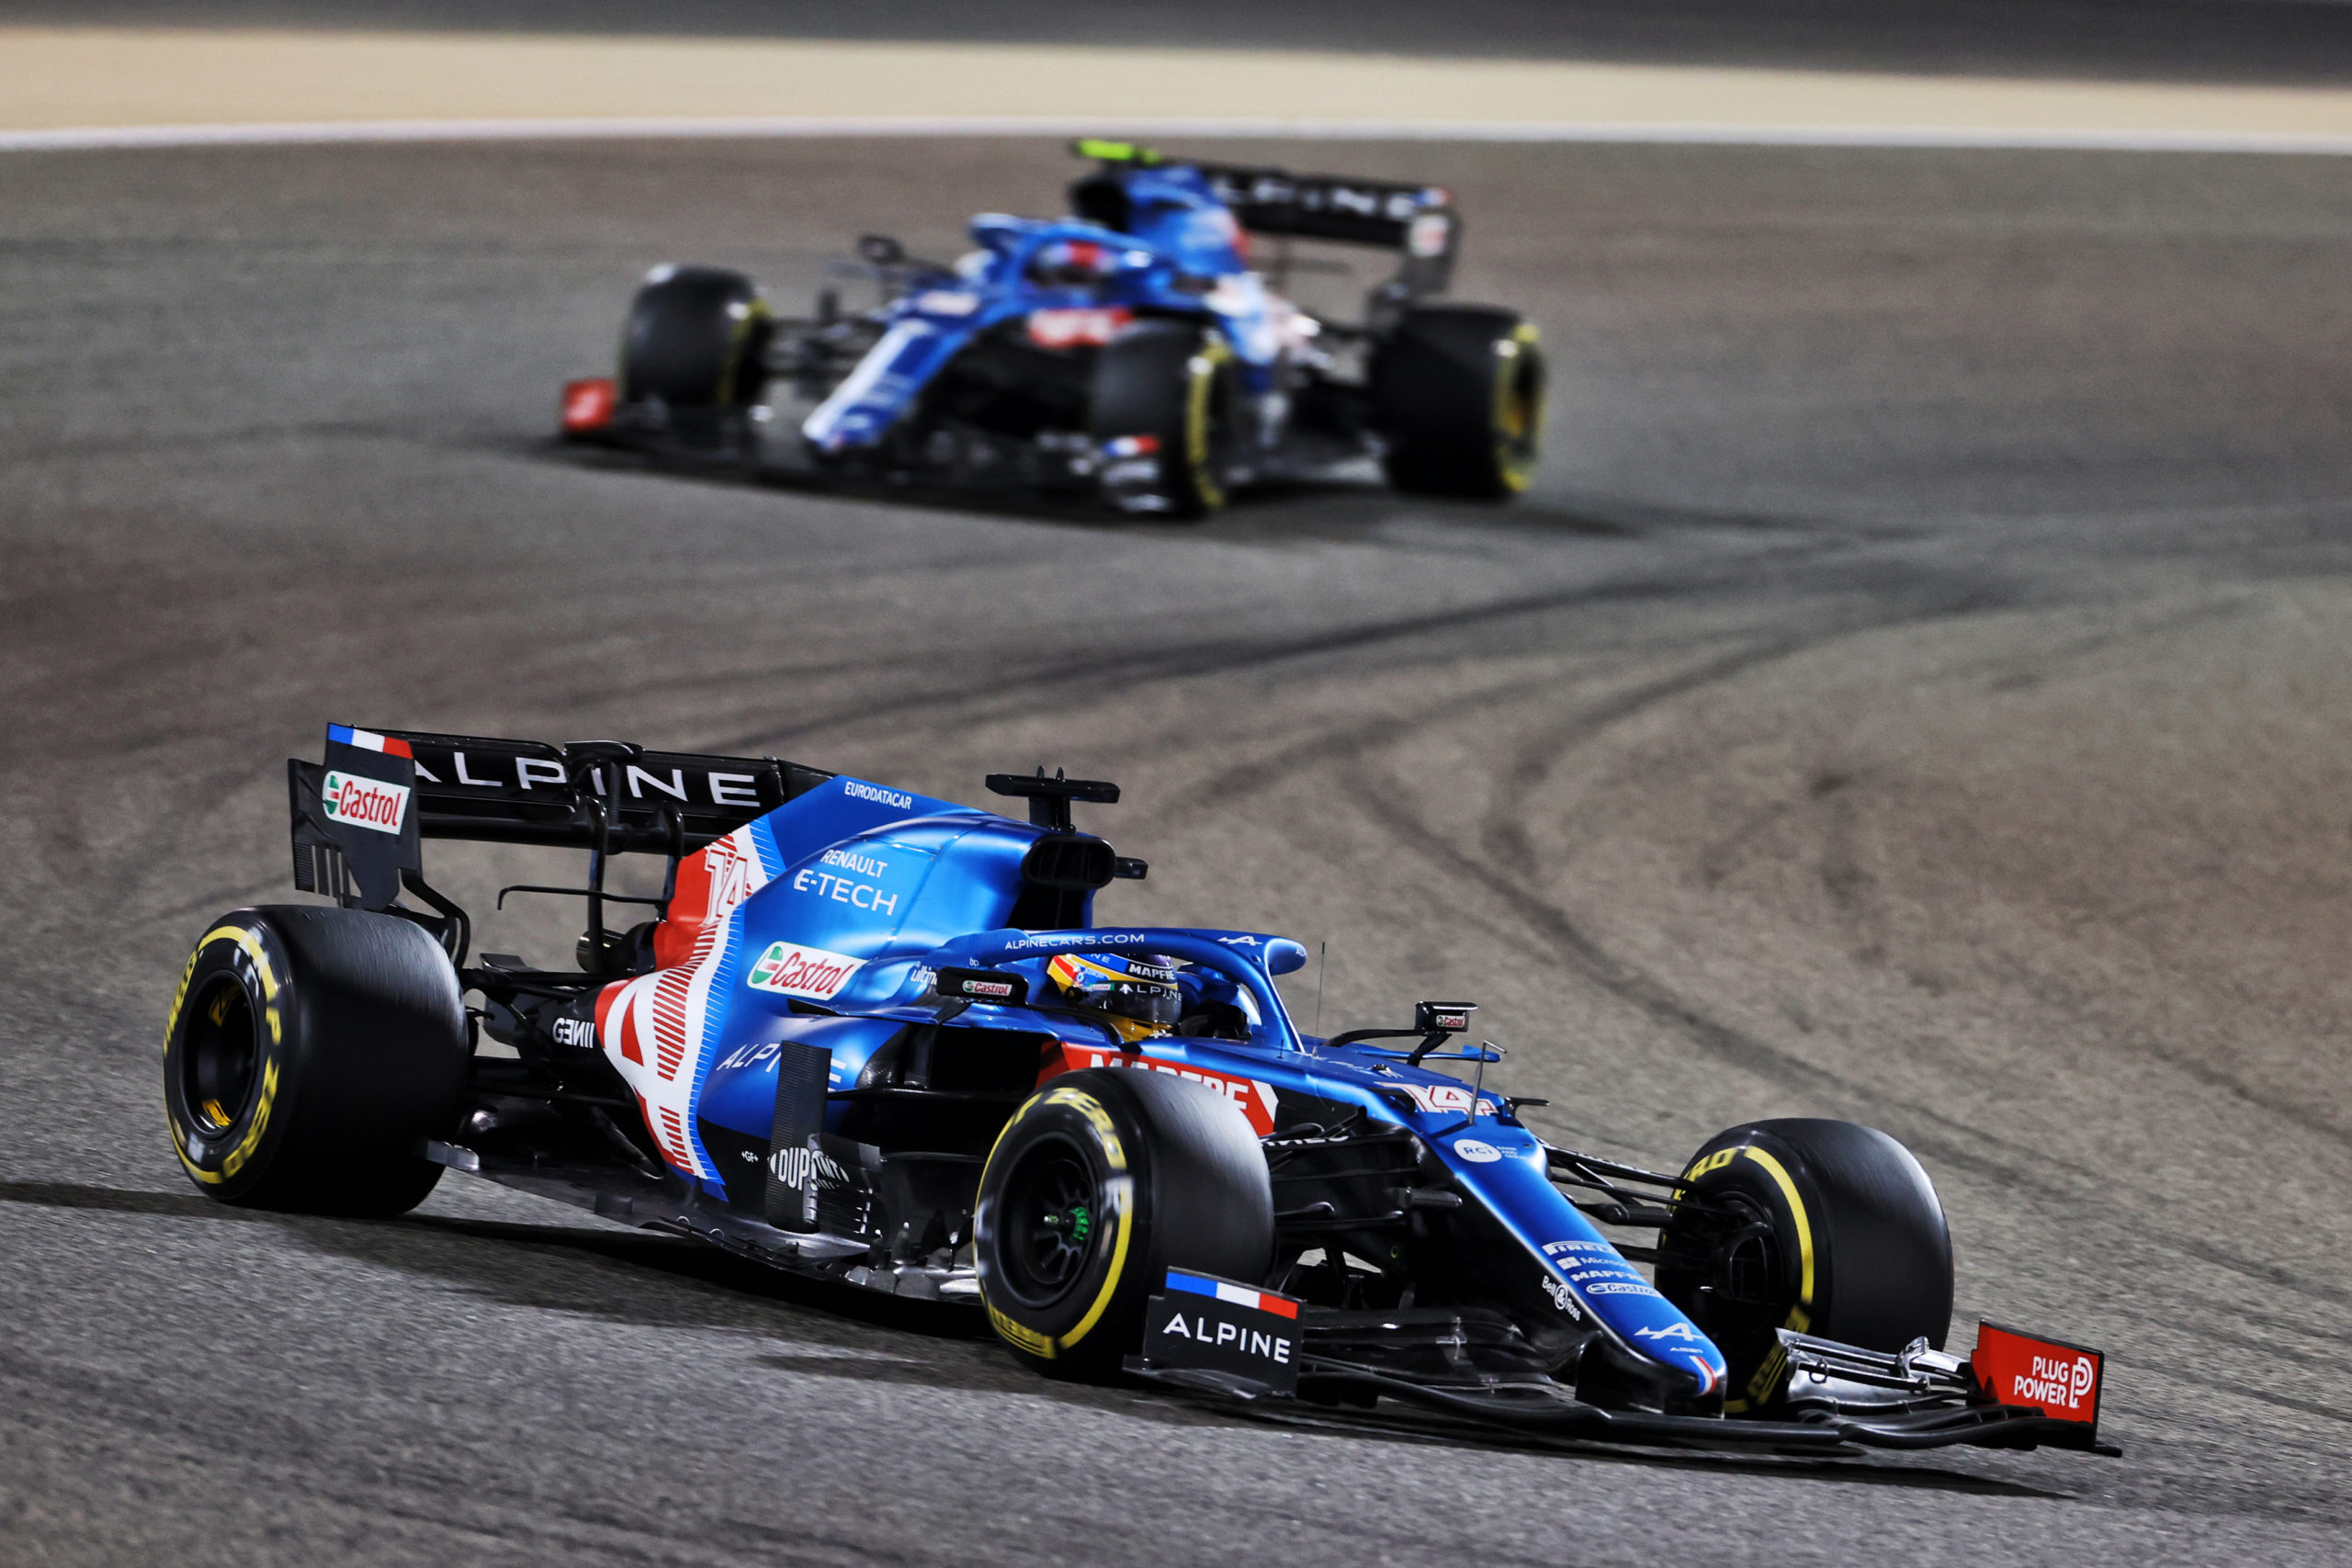 Fernando Alonso (ESP) Alpine F1 Team A521 leads team mate Esteban Ocon (FRA) Alpine F1 Team A521. Bahrain Grand Prix, Sunday 28th March 2021. Sakhir, Bahrain.